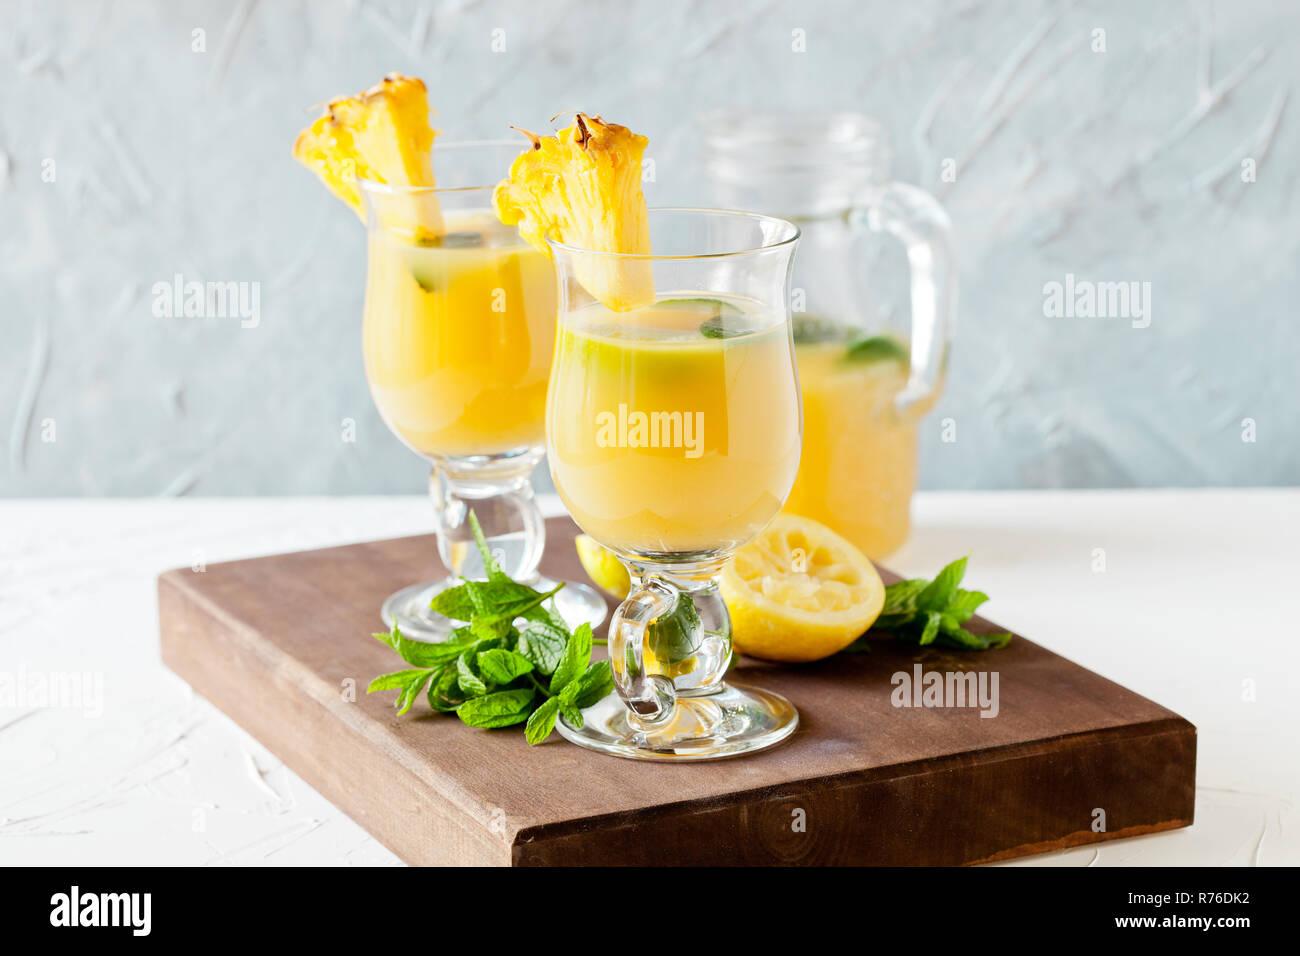 Refreshing Pineapple Juice Stock Photo